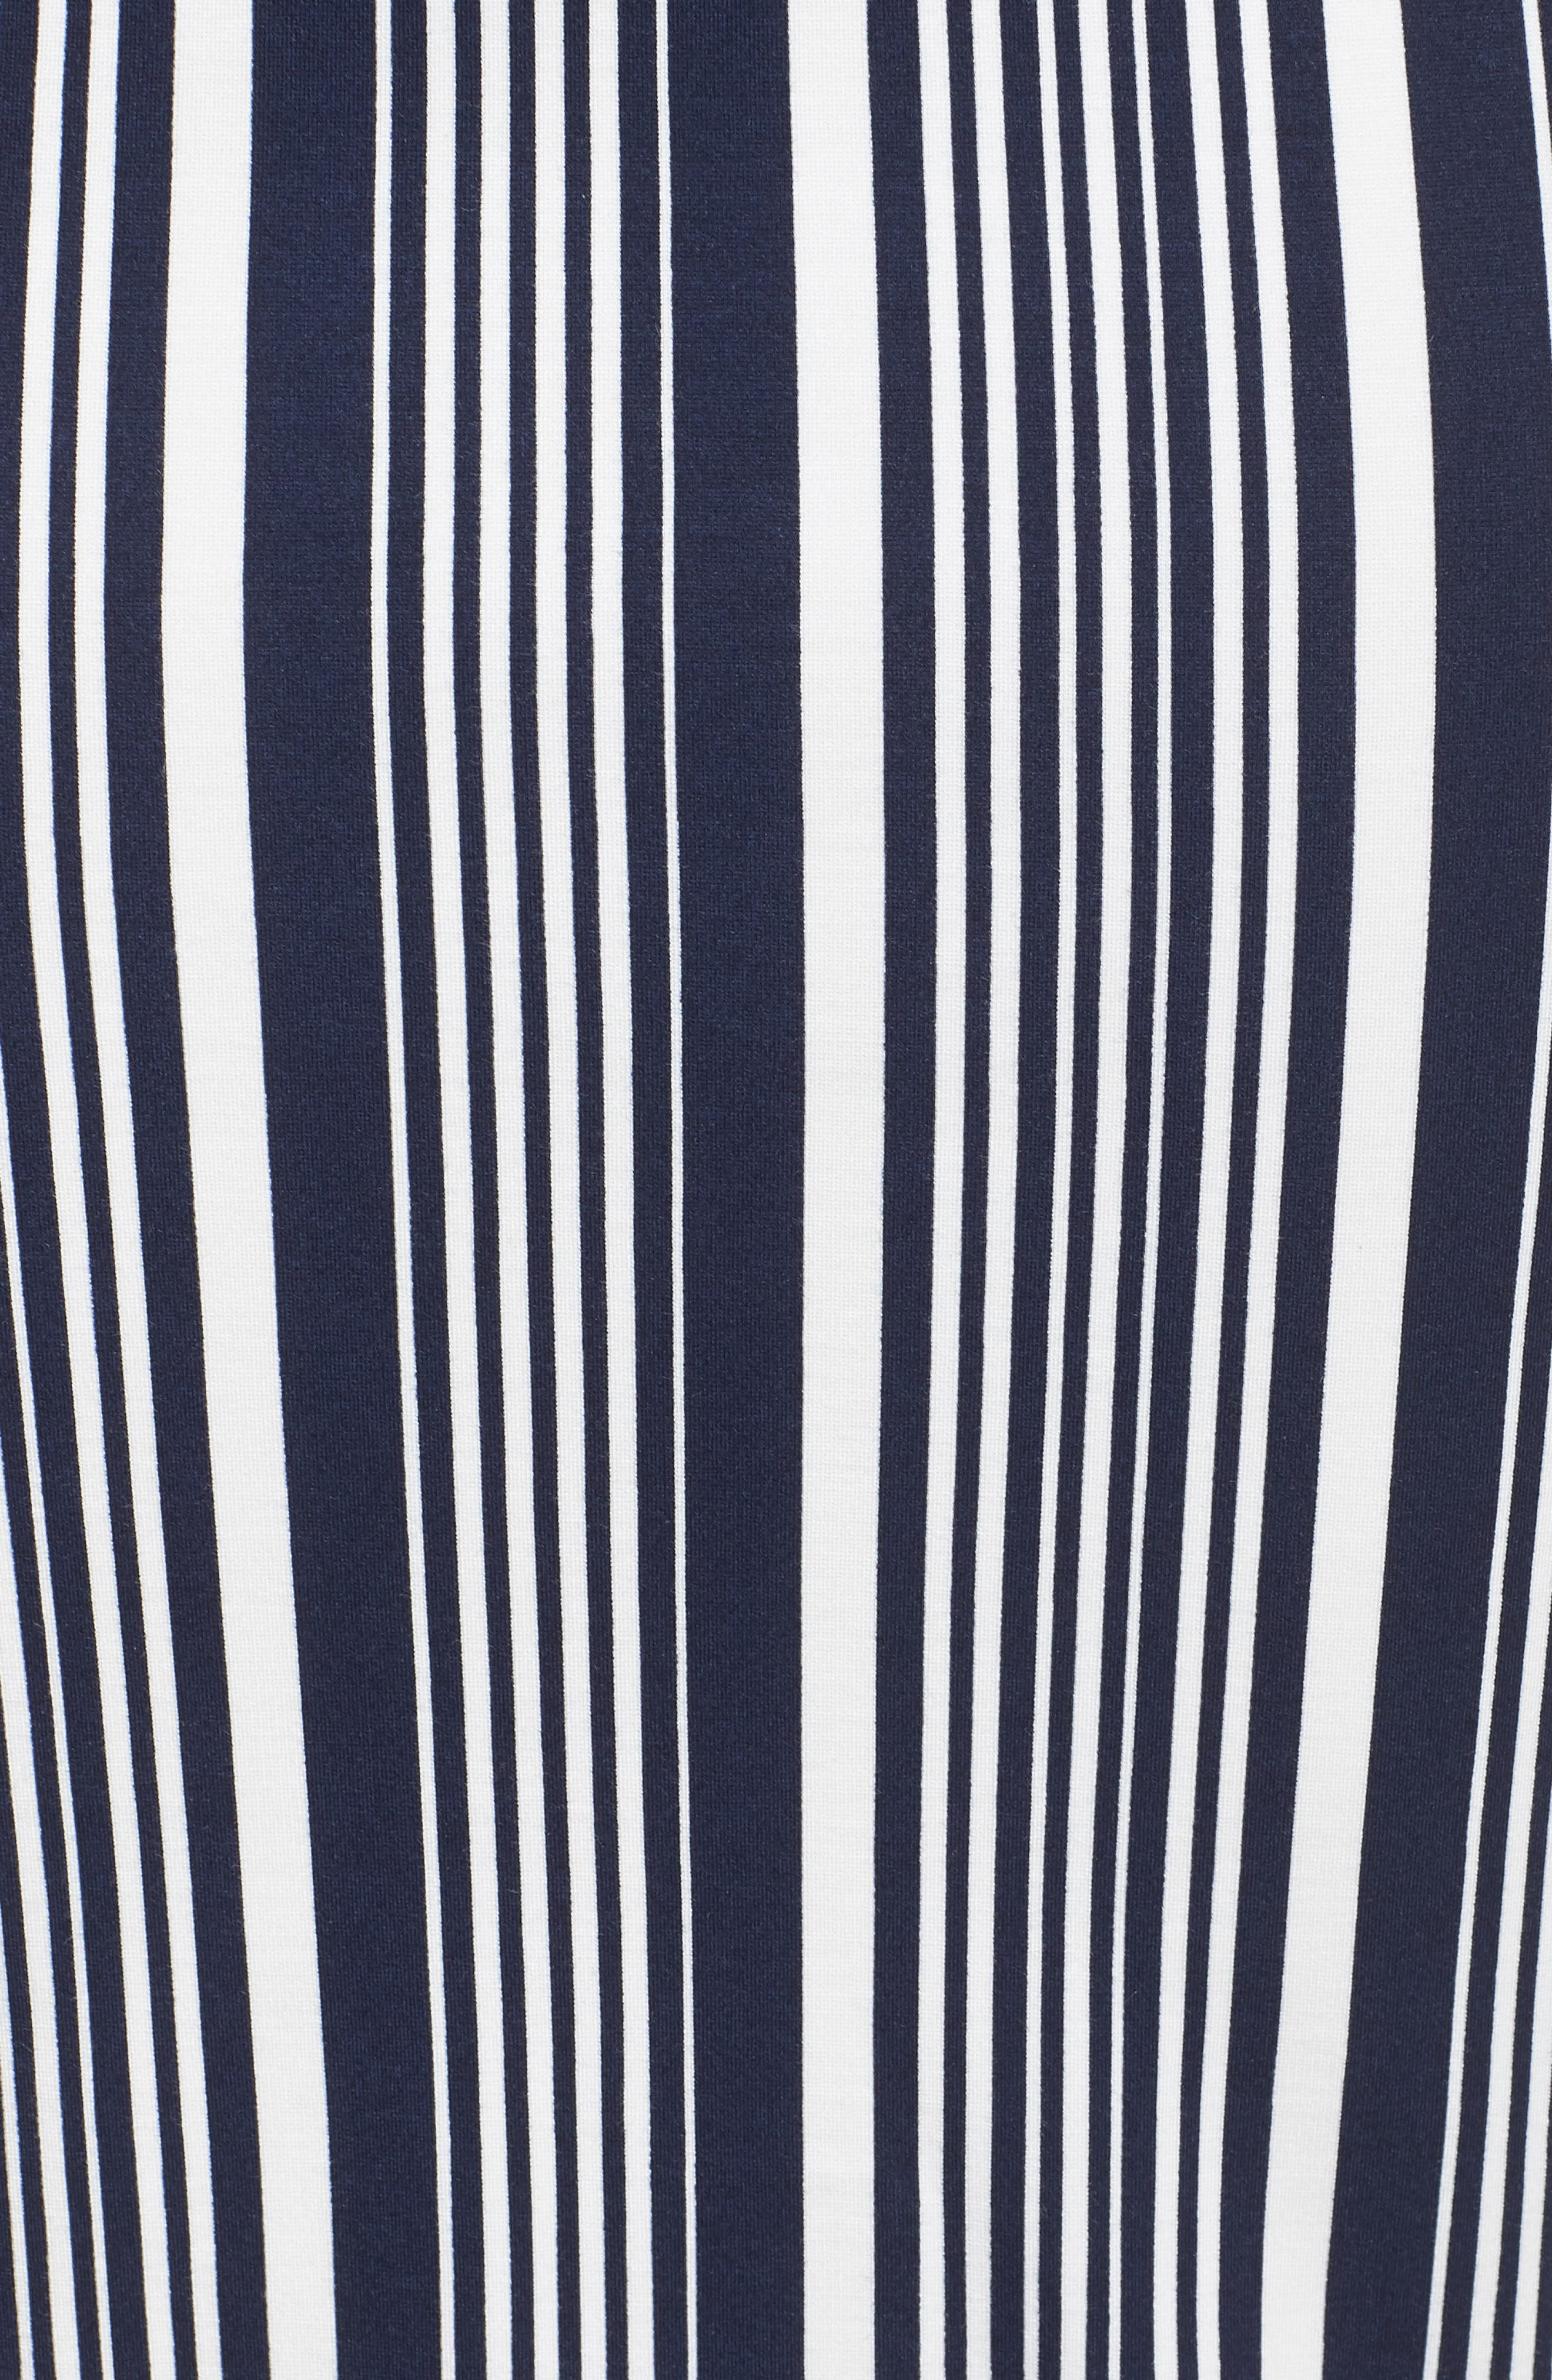 Stripe Ponte Pencil Skirt,                             Alternate thumbnail 5, color,                             Navy Alexis Stripe